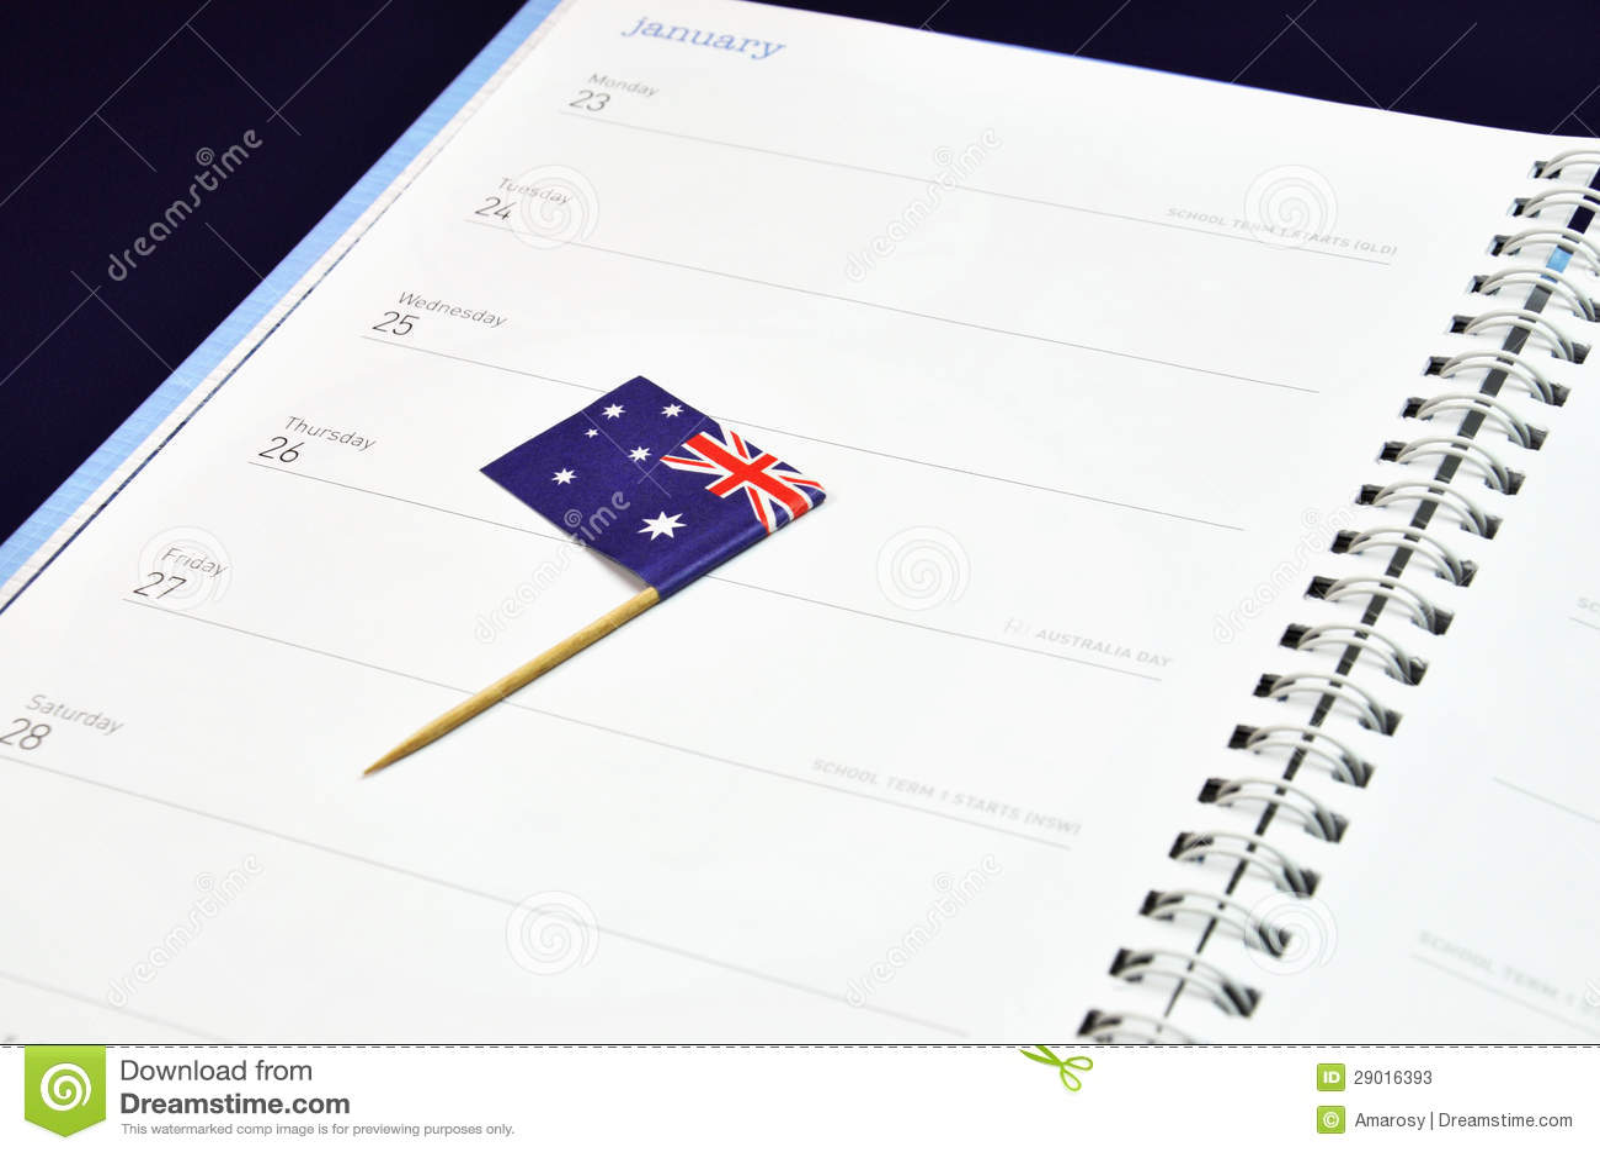 Save the date trailer in Australia